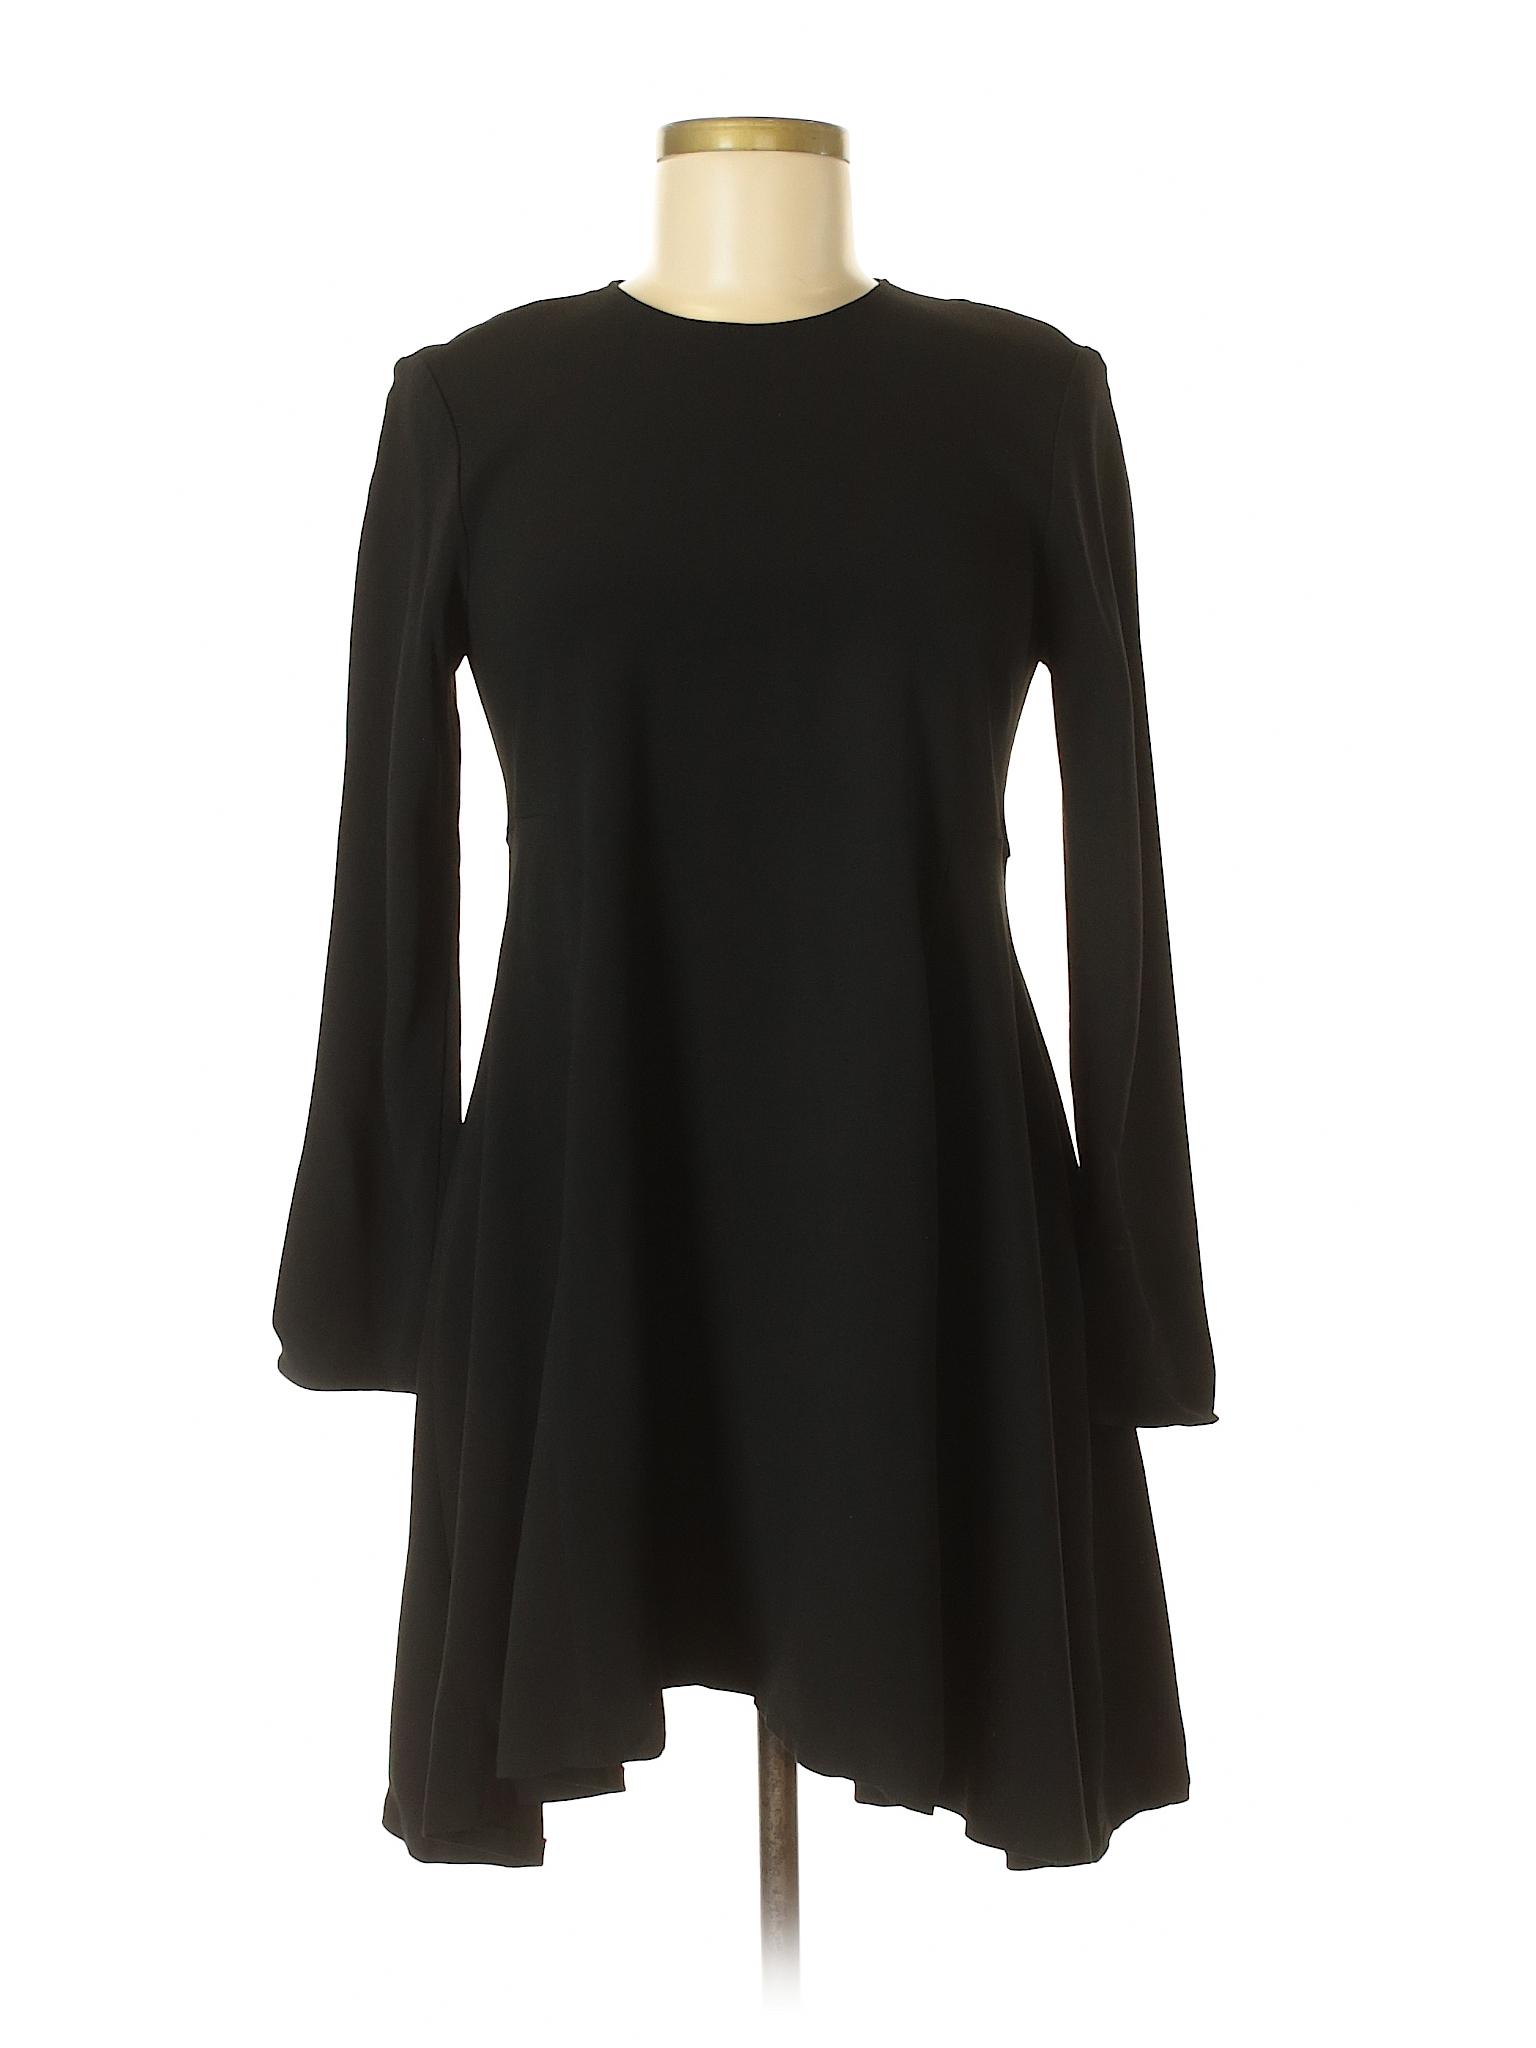 Dress Zara Dress winter Casual Casual Boutique Casual winter Boutique Zara winter Boutique Dress Zara Pr8PxqwBH